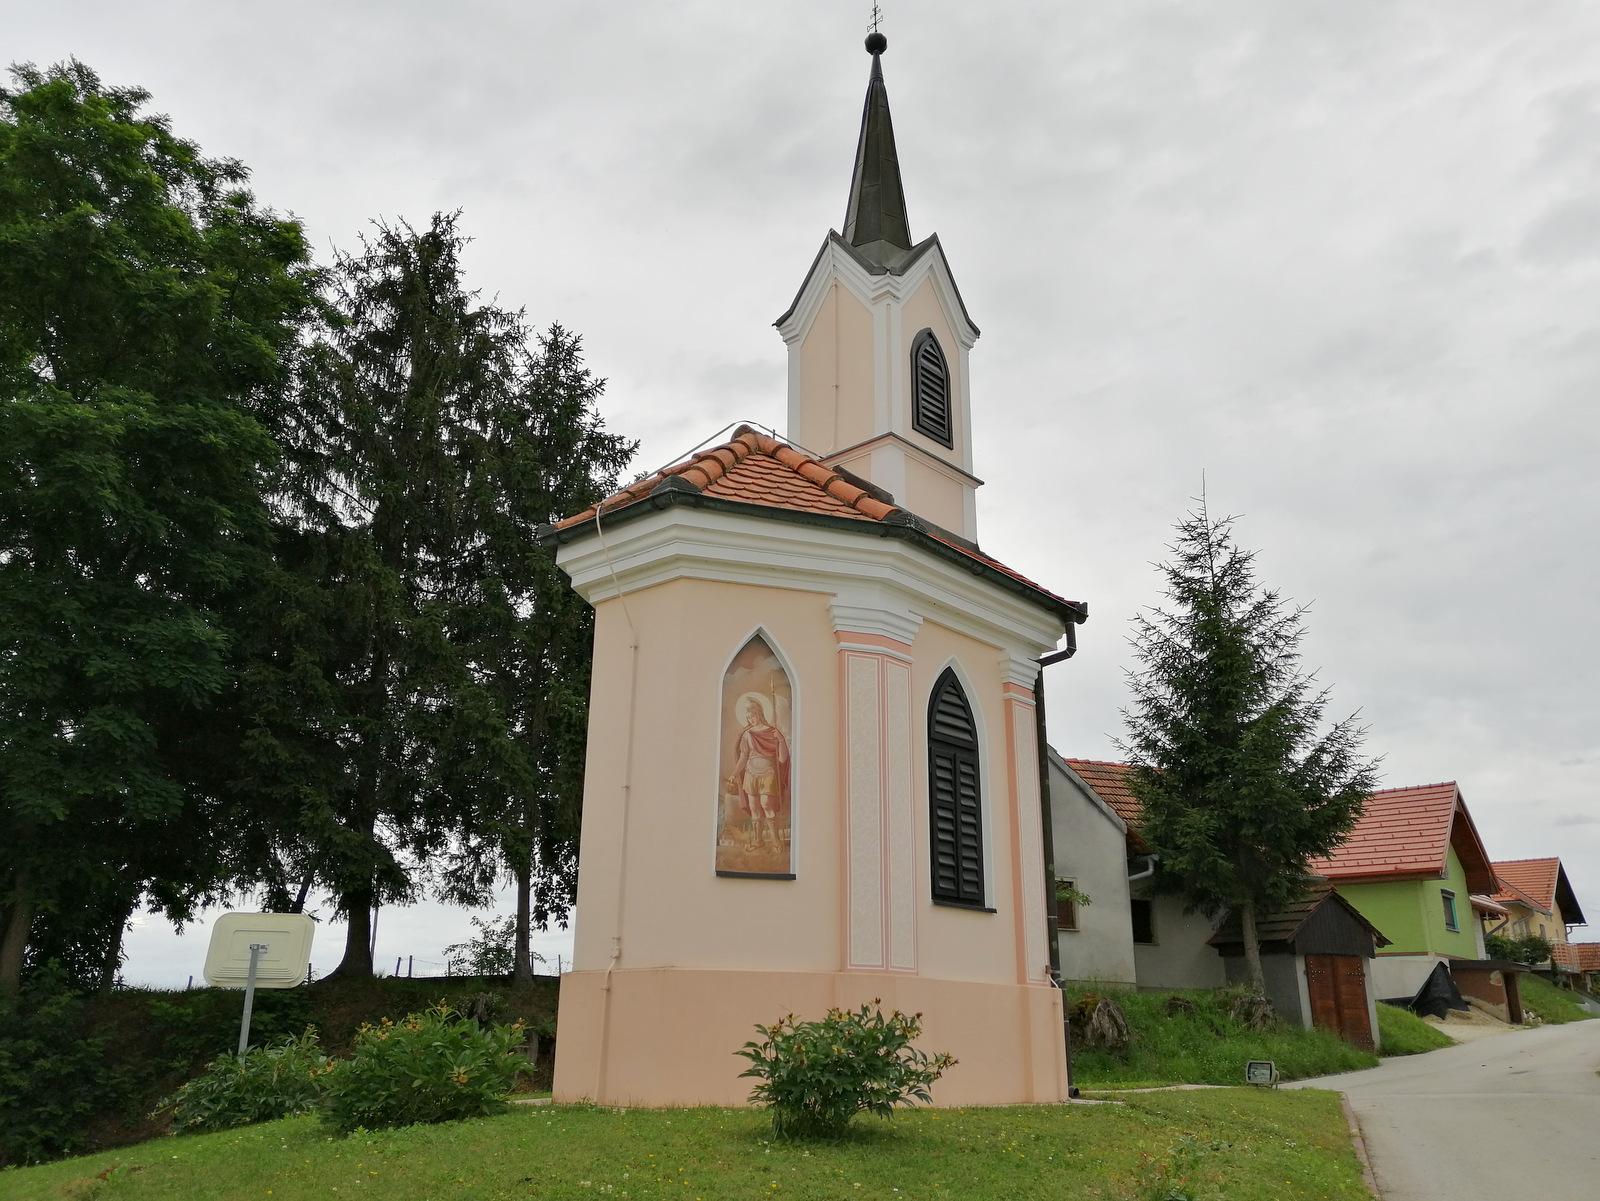 Šprinc, kapelica